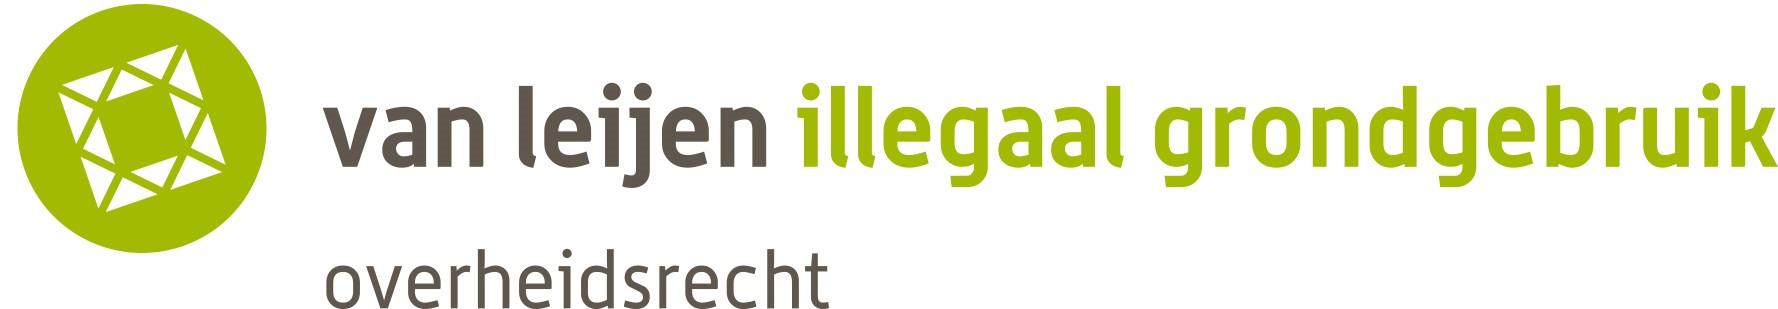 Illegaalgrondgebruik.nl